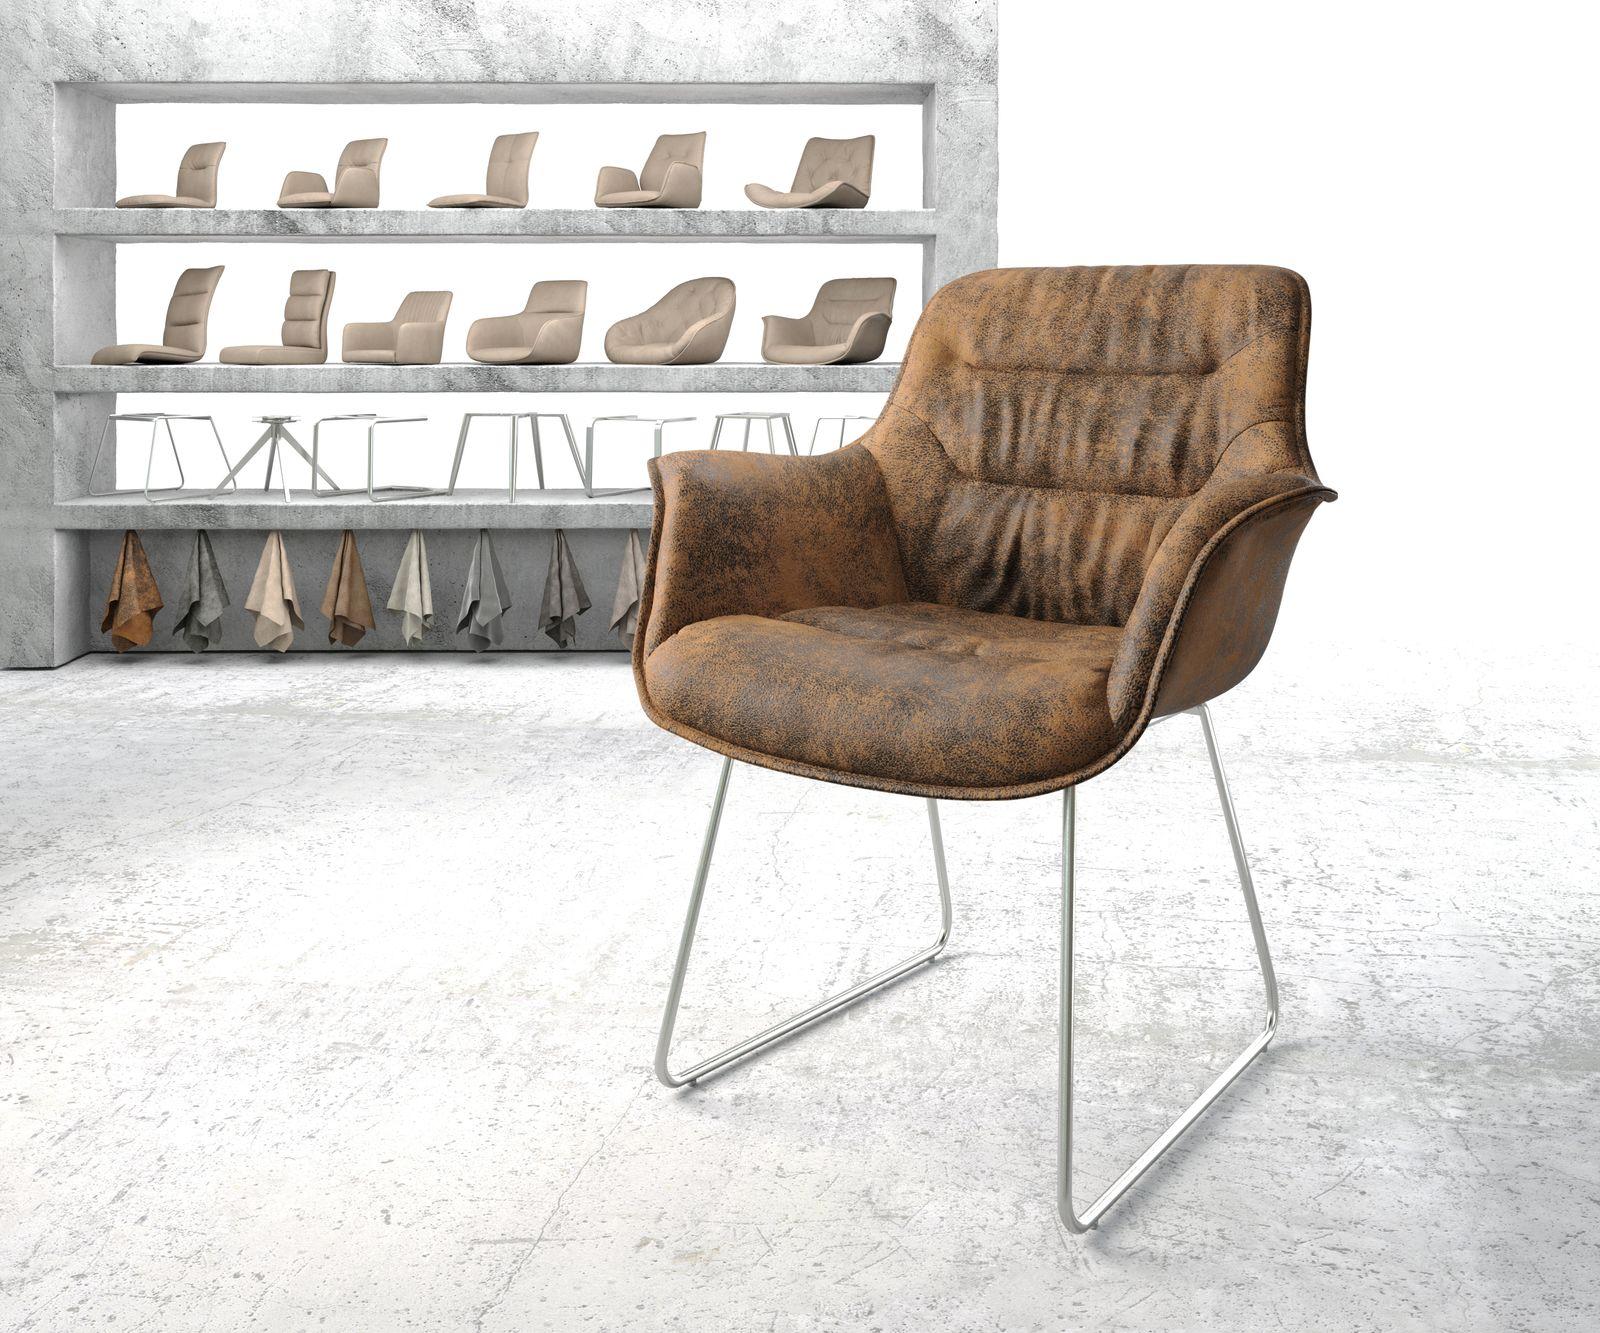 delife-armlehnstuhl-kaira-flex-braun-vintage-kufengestell-edelstahl-esszimmerstuhle